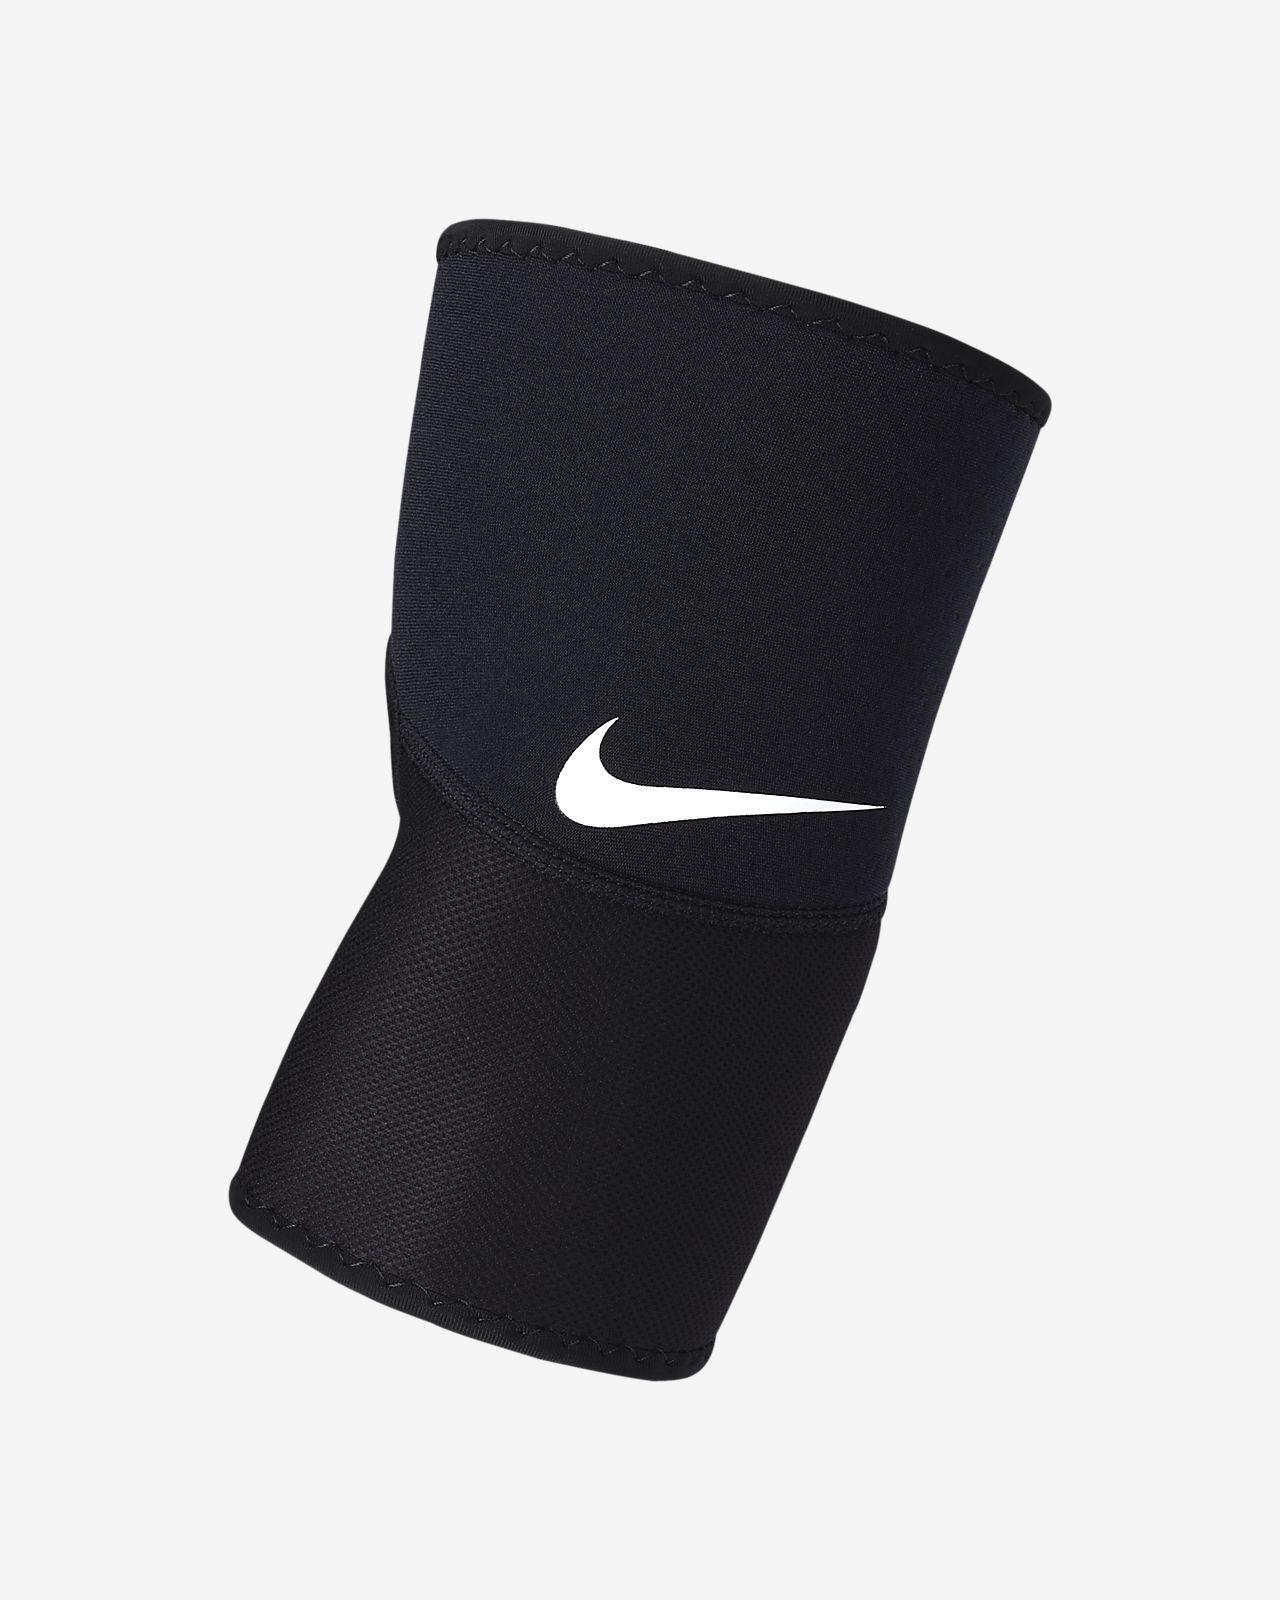 Nike Pro 2.0 肘部护套(1 只)